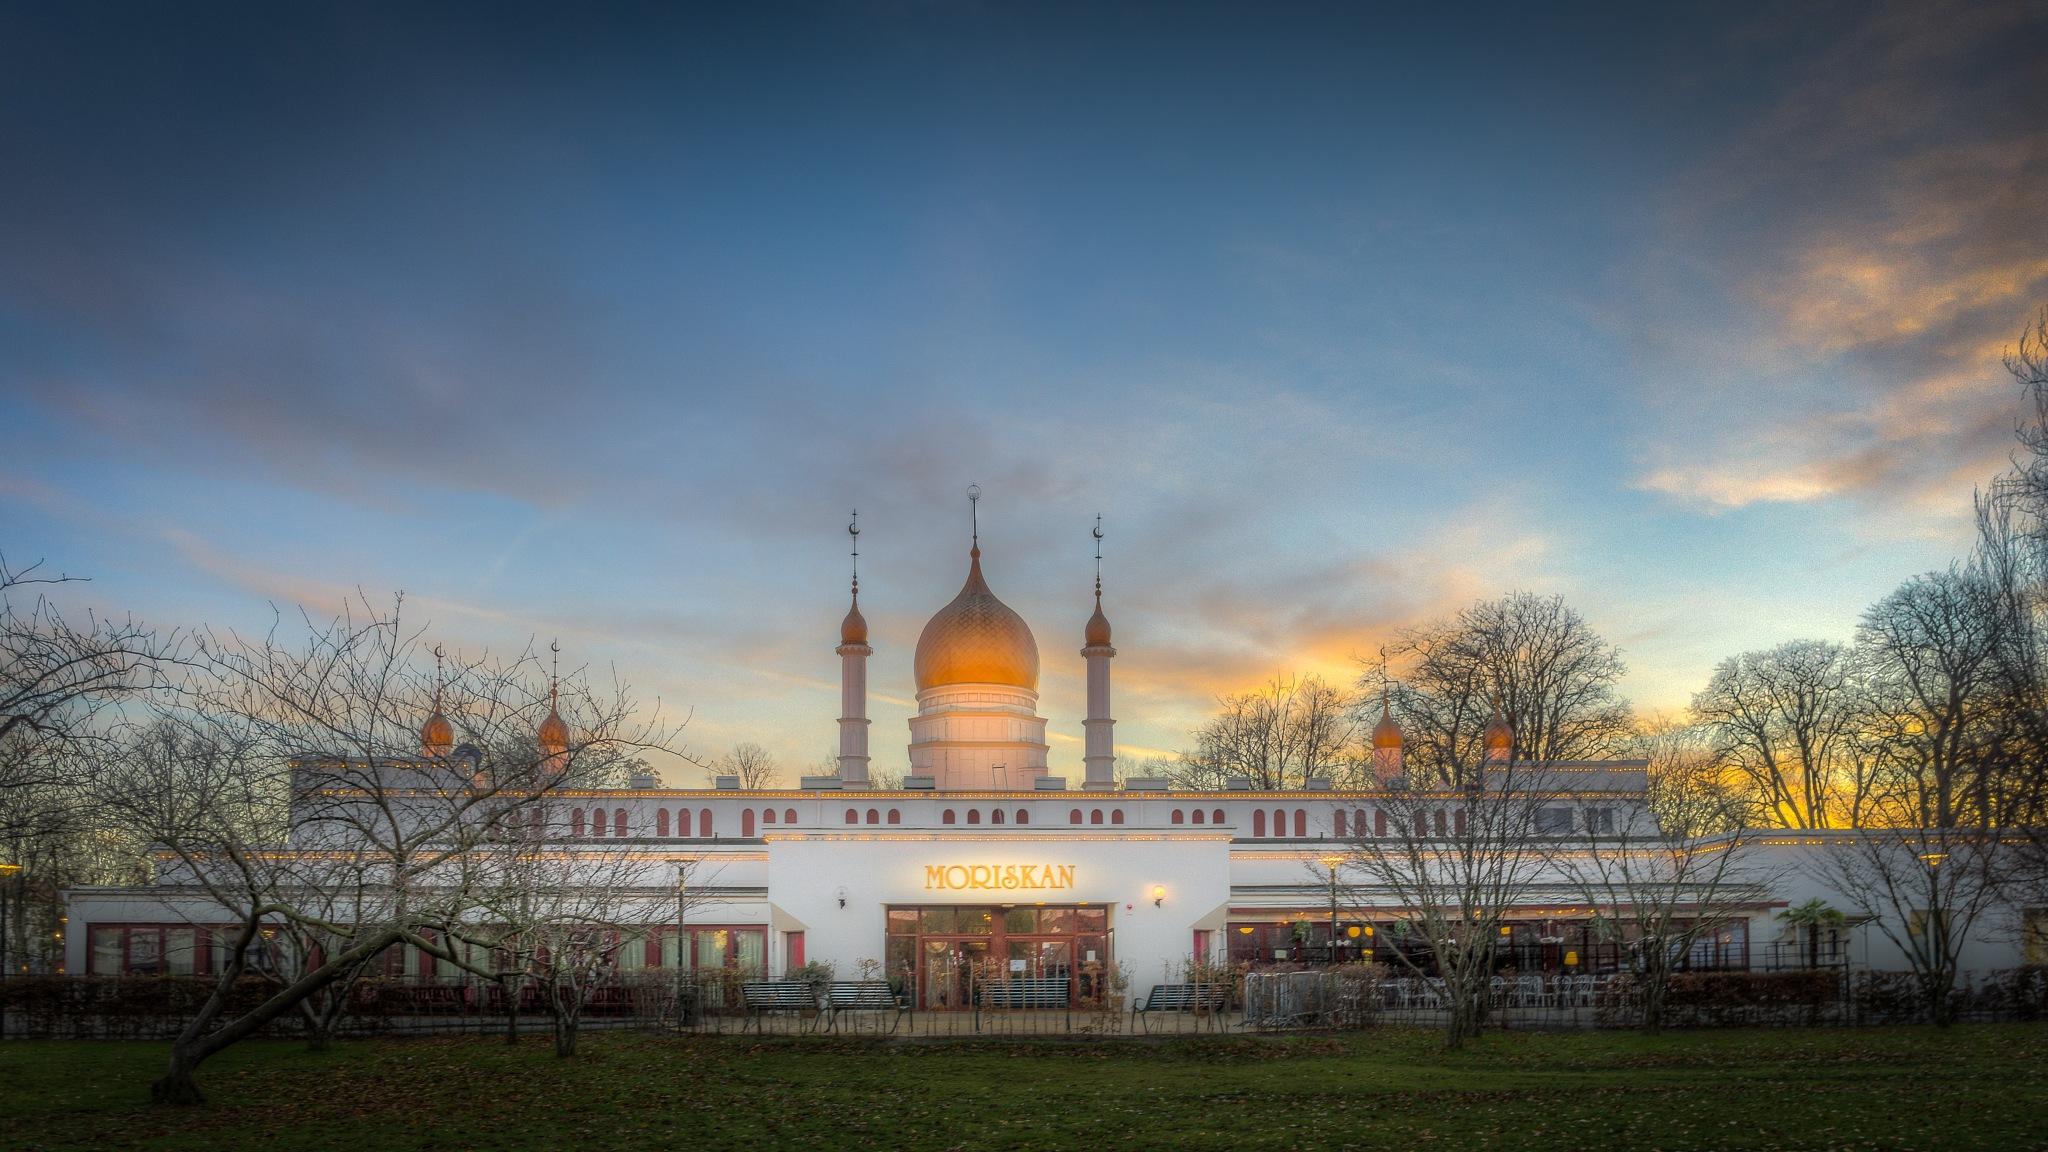 The Moorish pavillion by Mirza Buljusmic